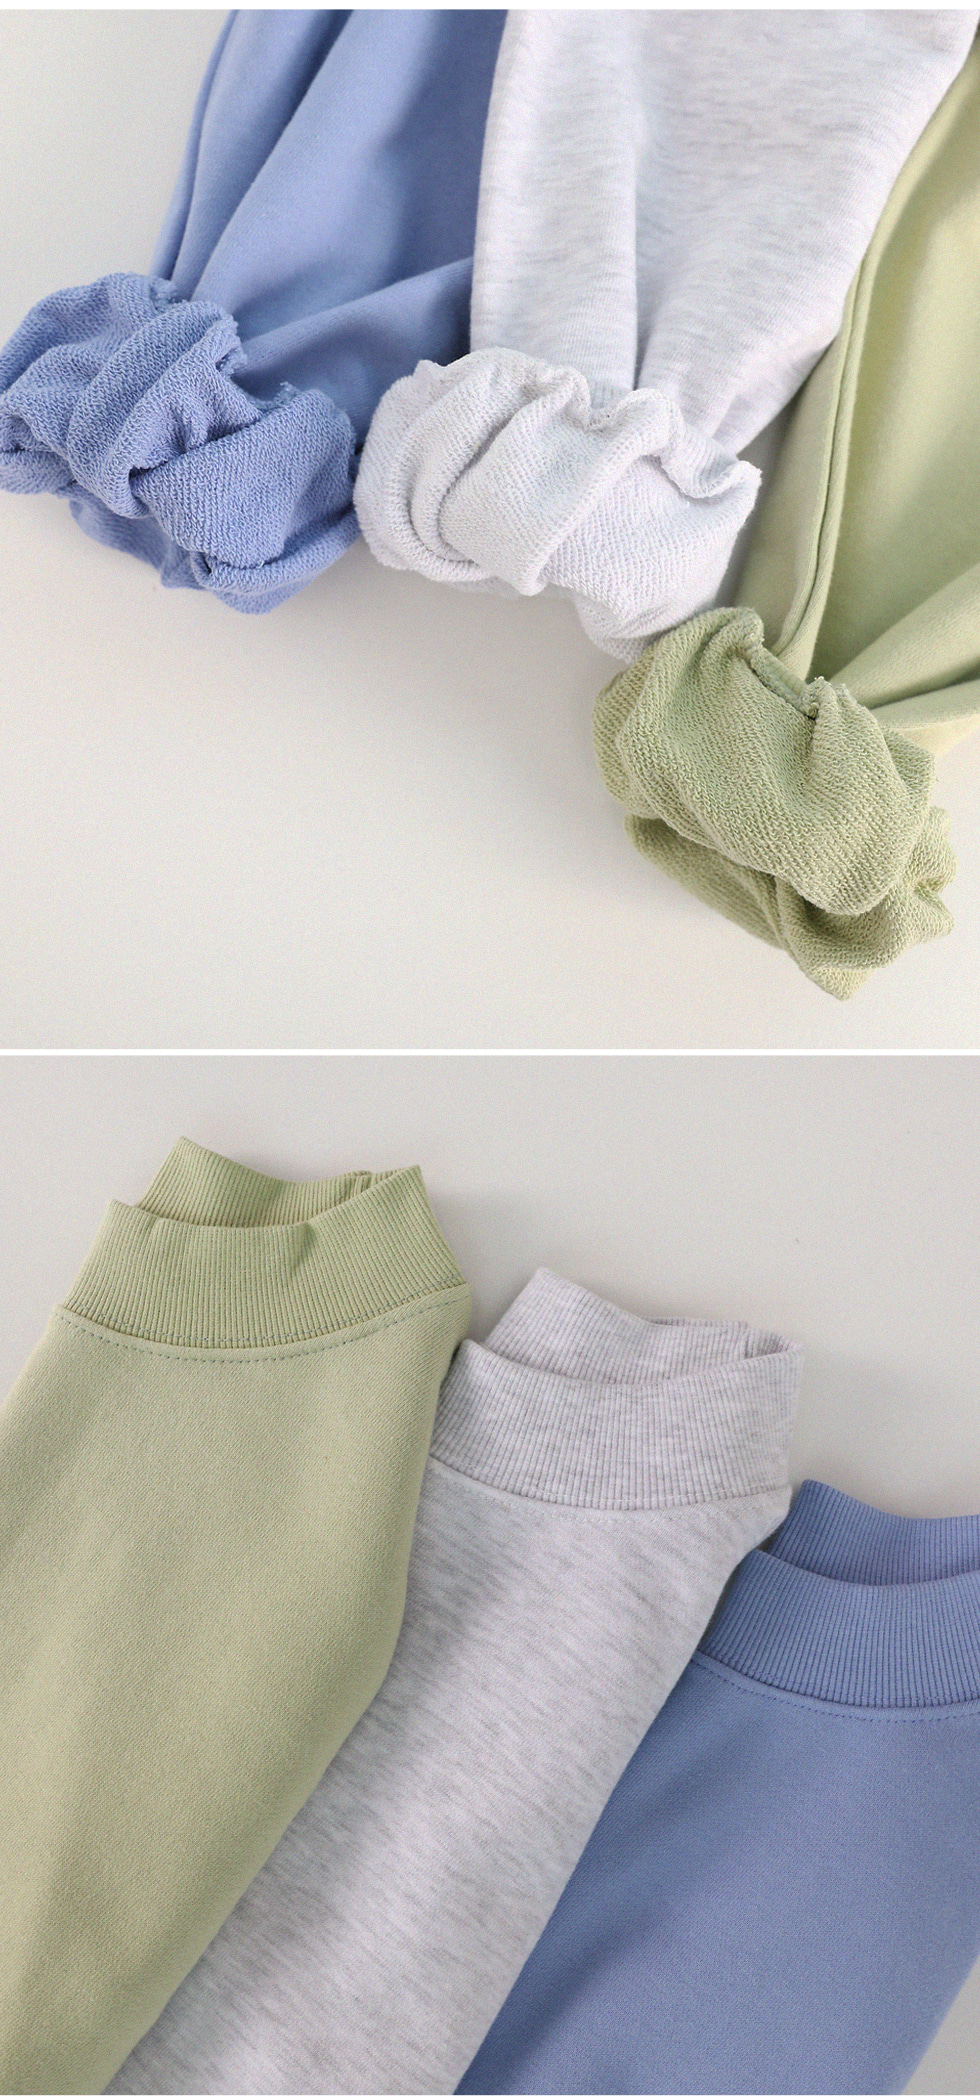 Normaban Polar sweat shirt